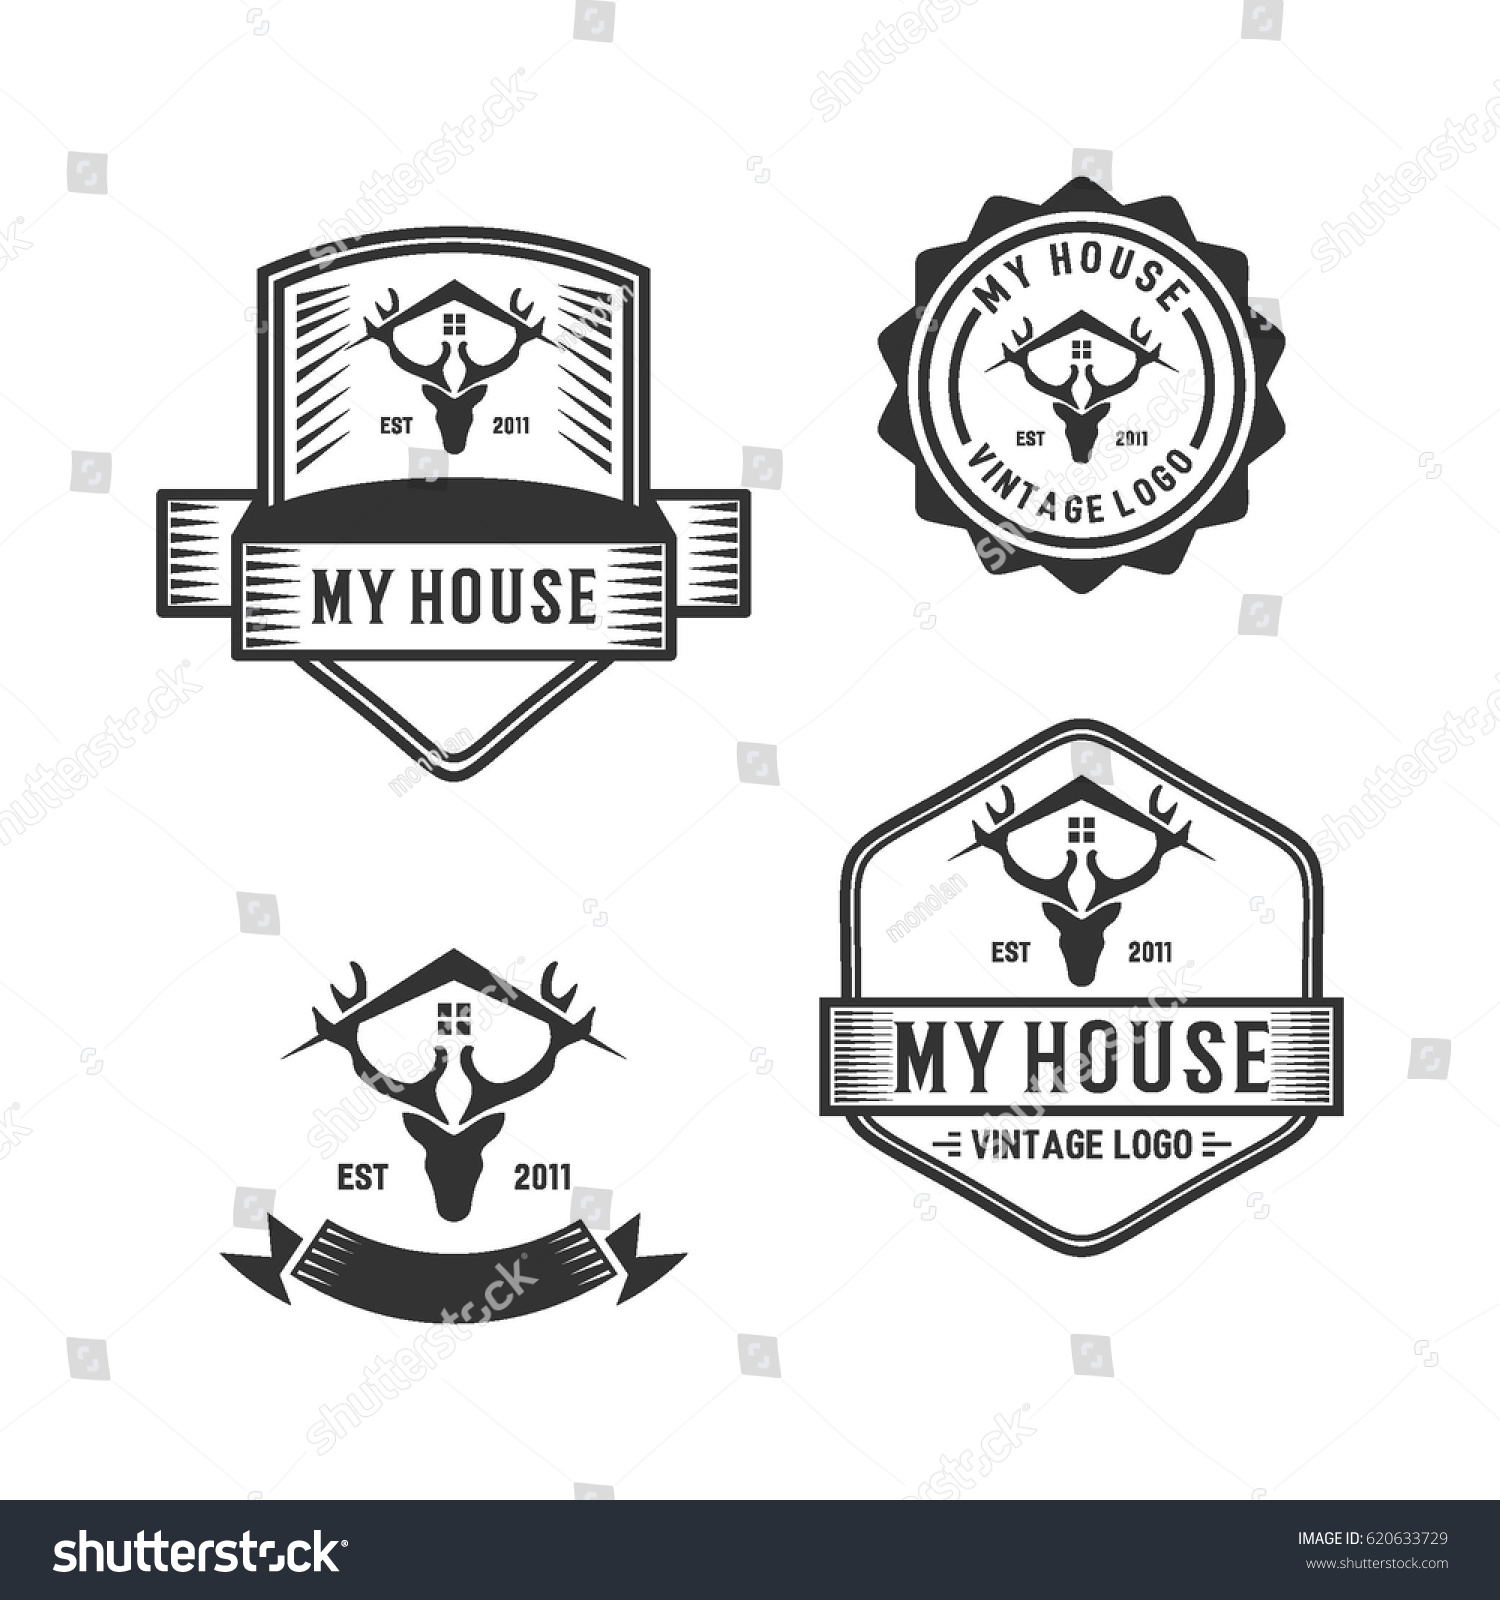 old logo badge vintage house logo のベクター画像素材 ロイヤリティ